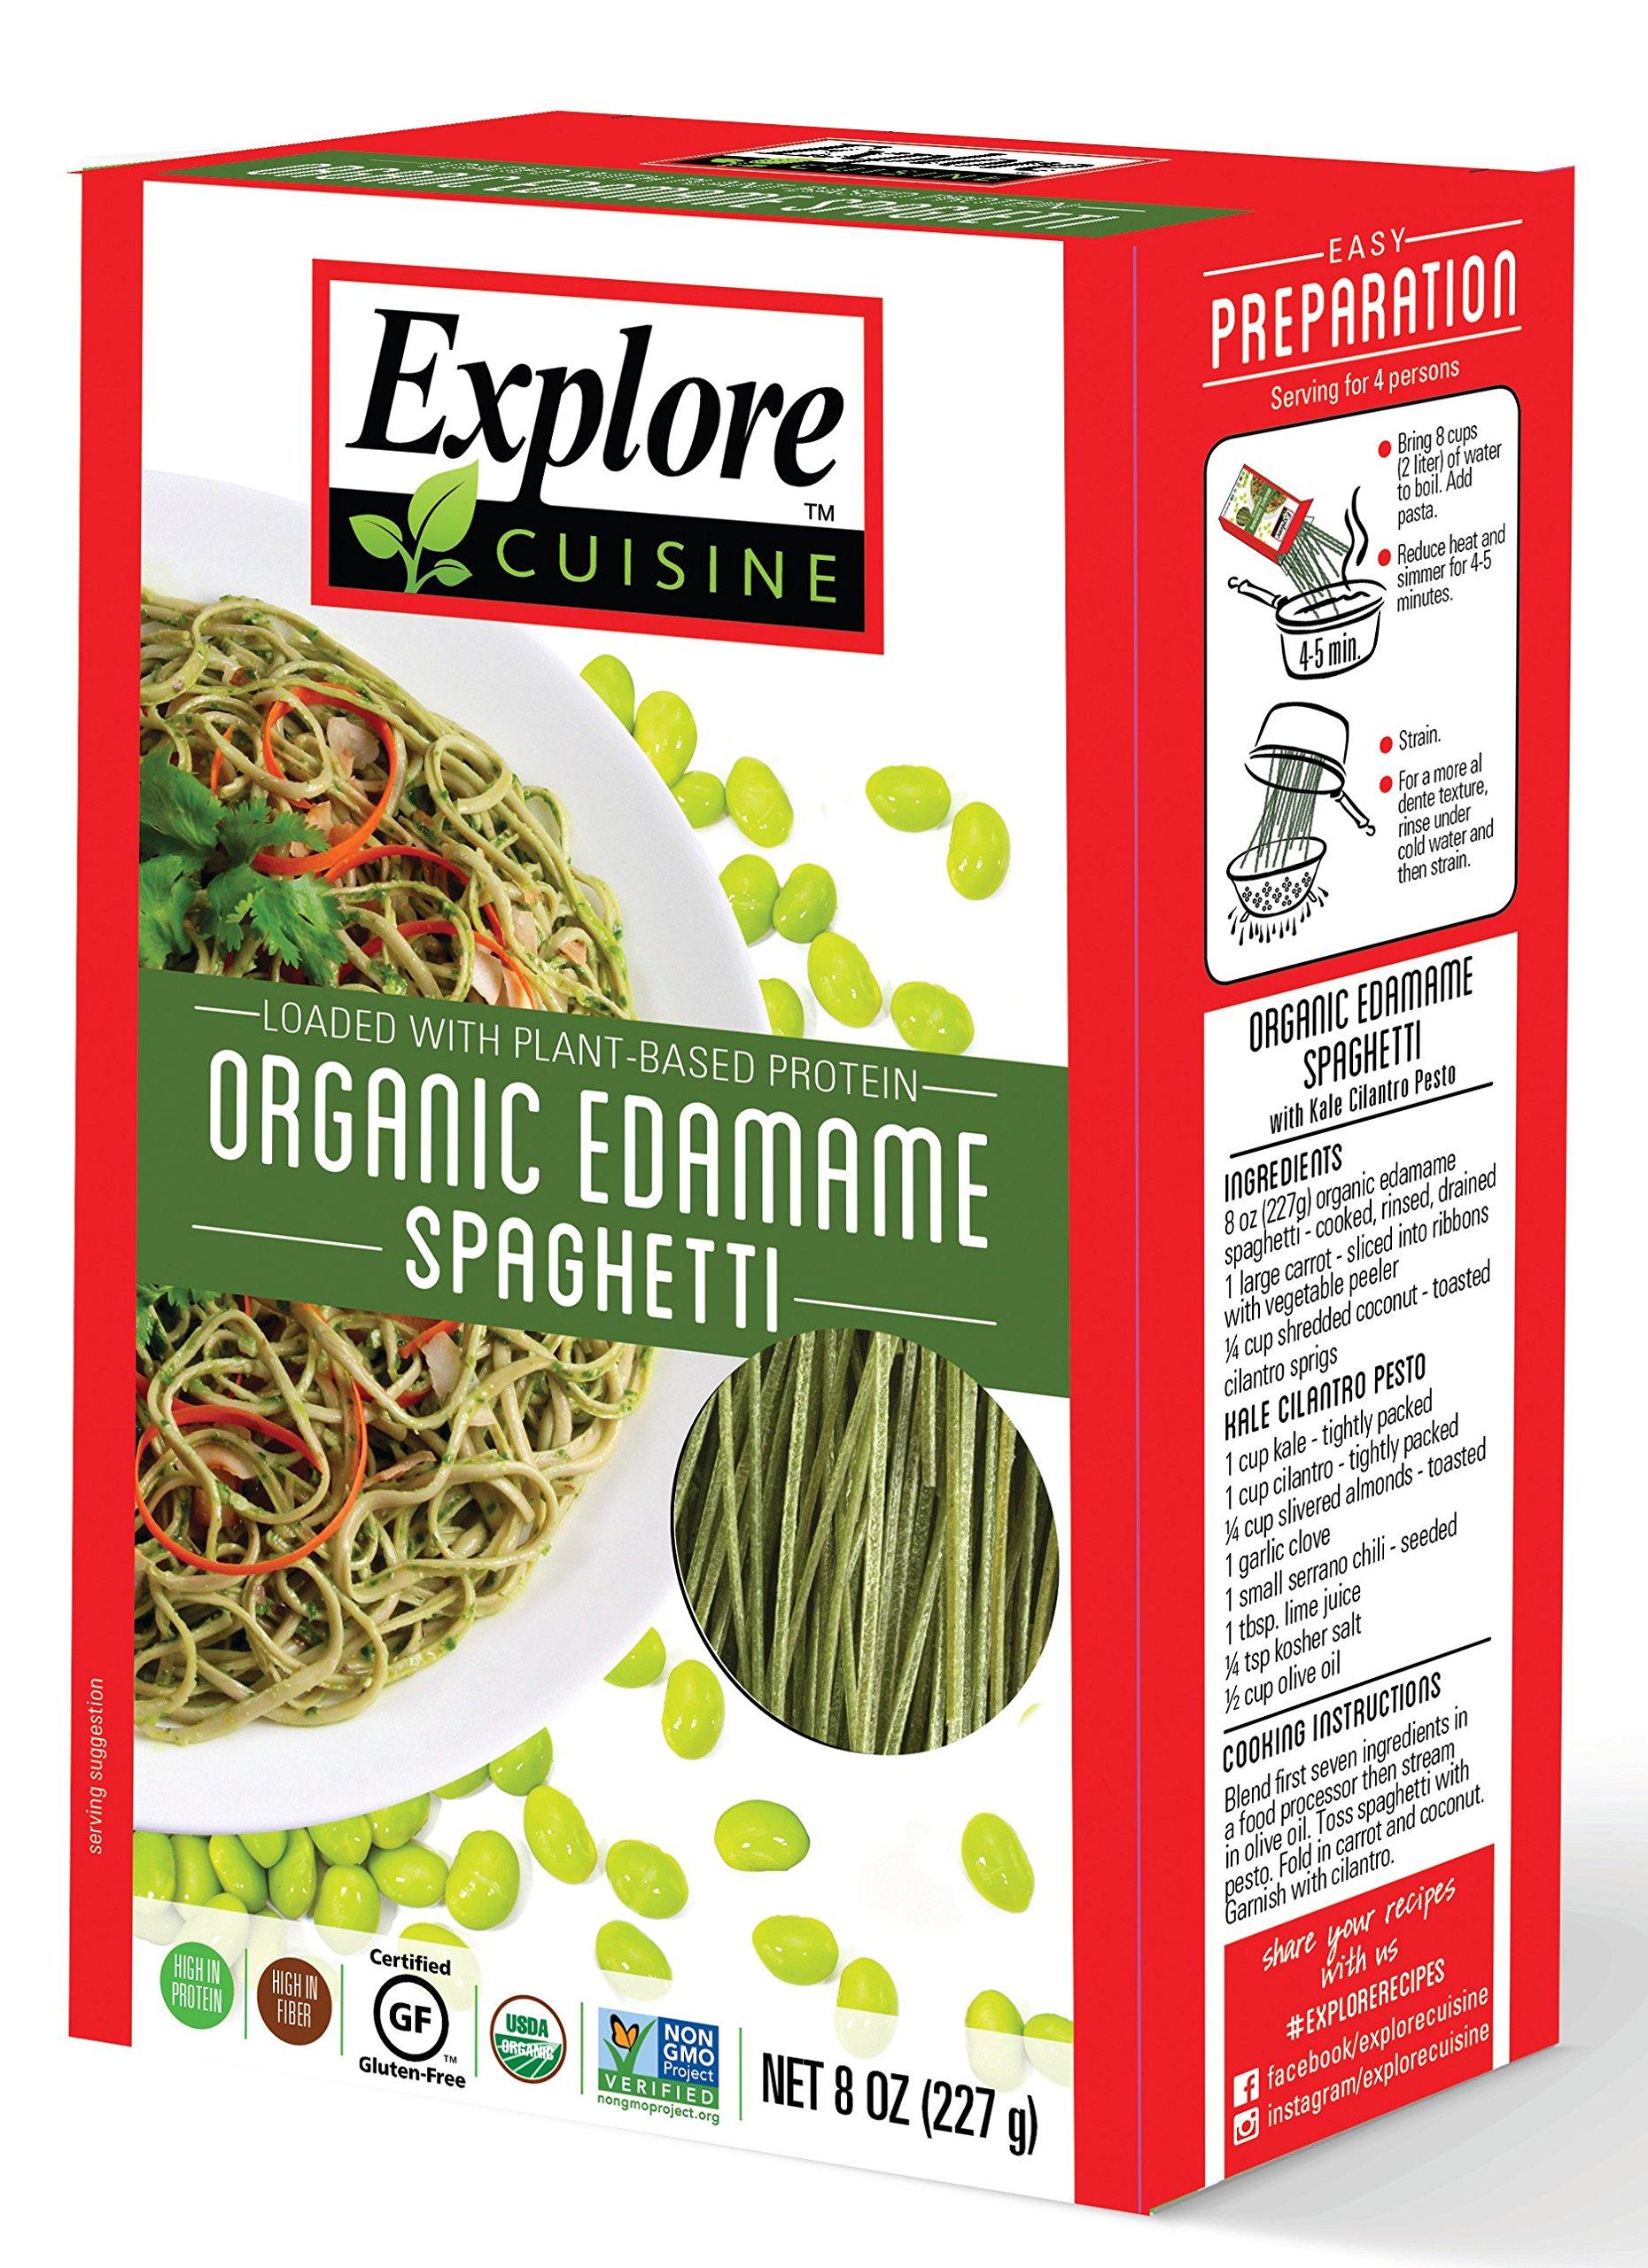 Explore Asian - Organic Edamame Spaghetti, 8 oz - 4 Pack | High Protein, High Fiber Pasta